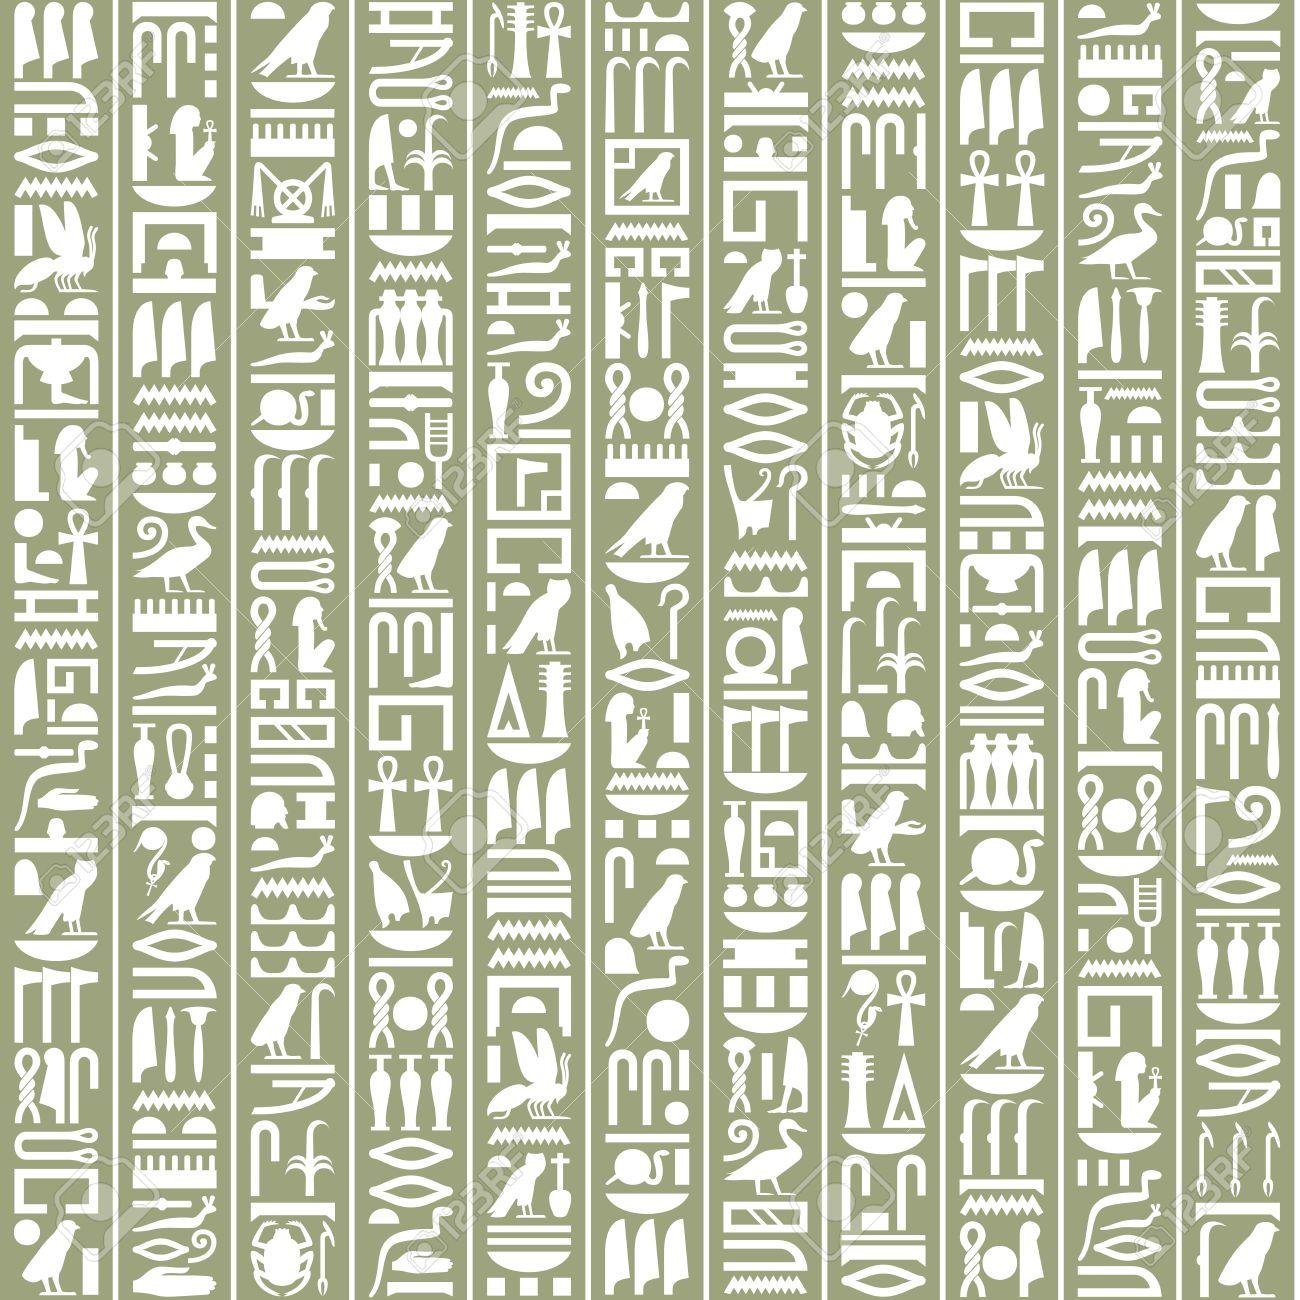 Ancient Egyptian Hieroglyphic Decorative Background Stock Vector